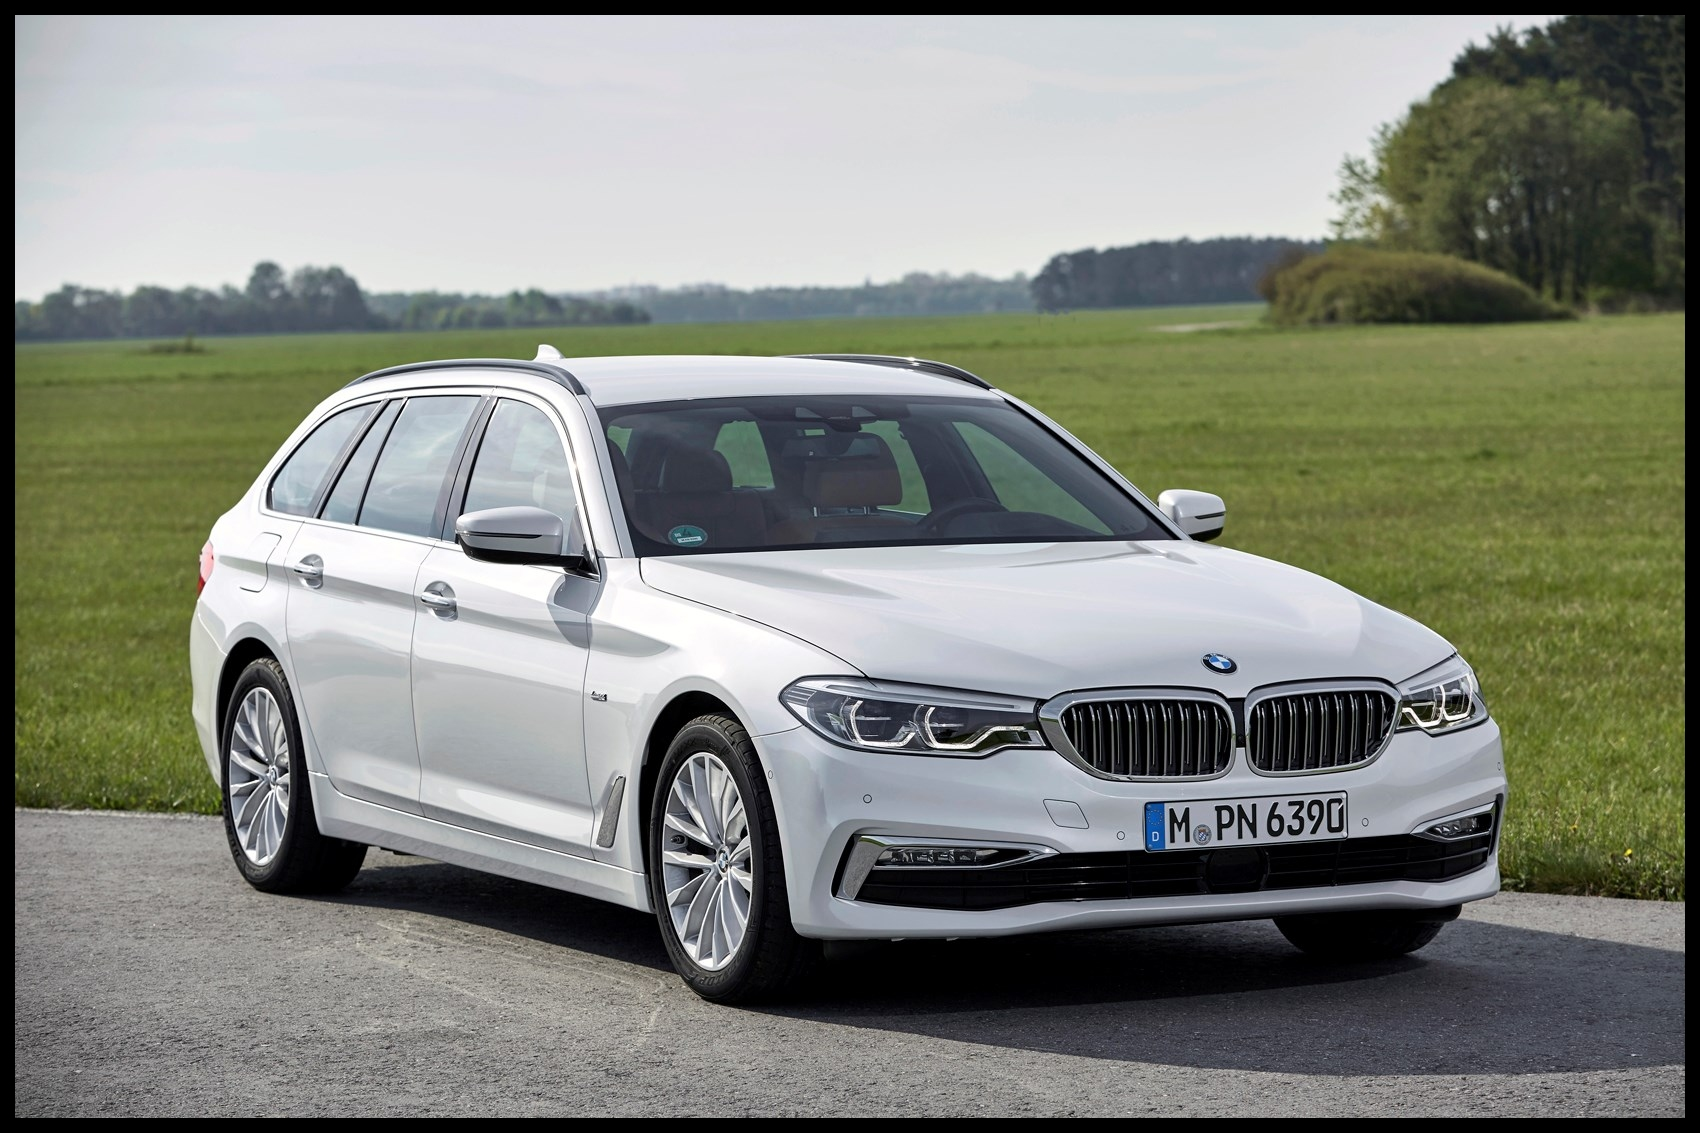 BMW 2017 5 Series Touring static exterior